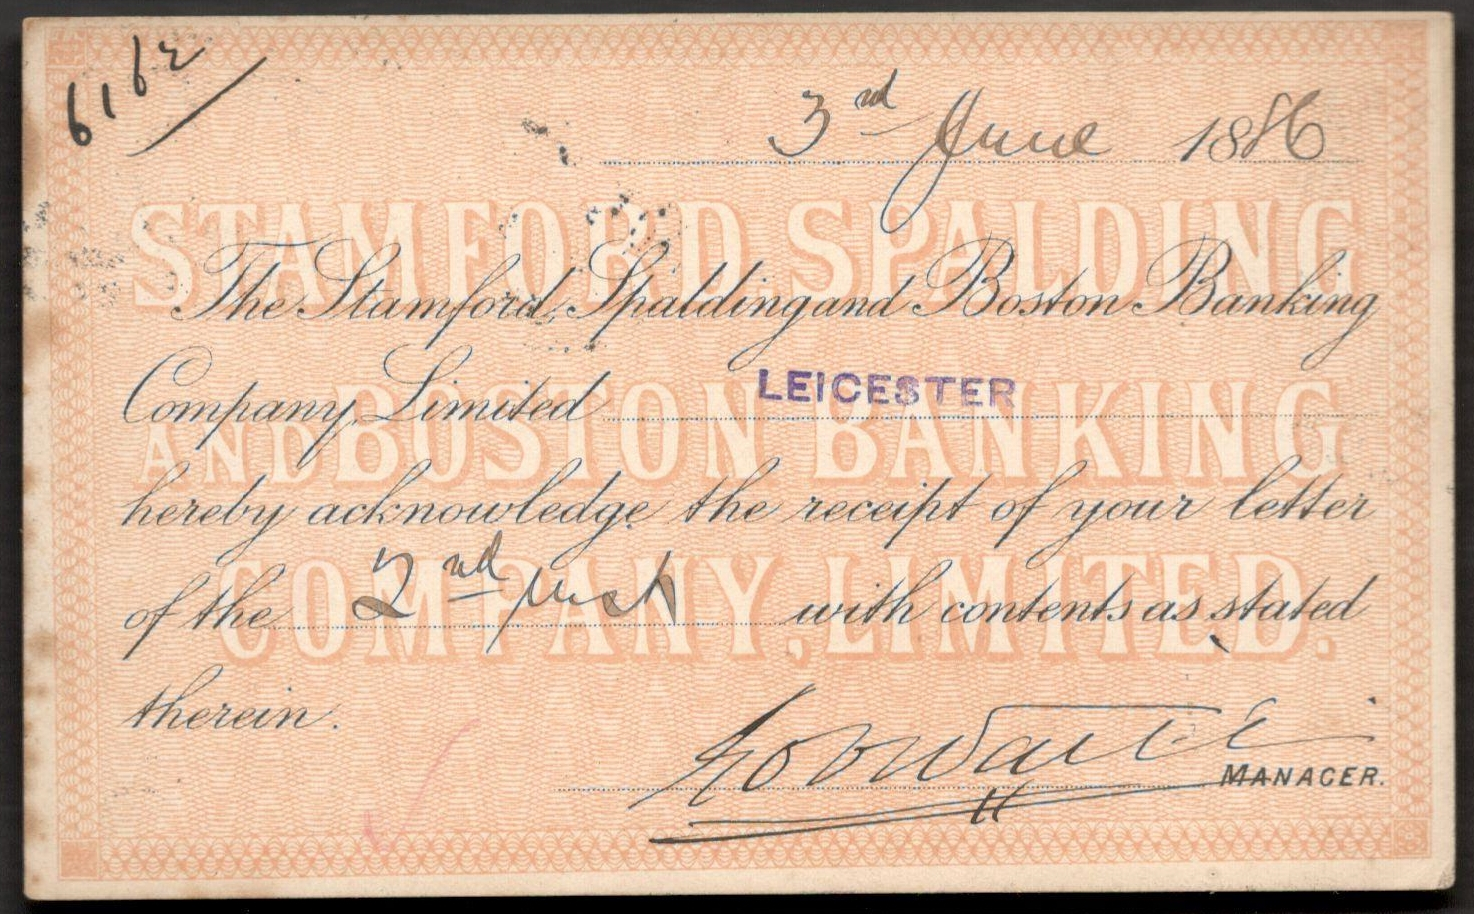 Lot 48 - QV POSTAL STATIONERY CARD 1886 STAMFORD SPALDING